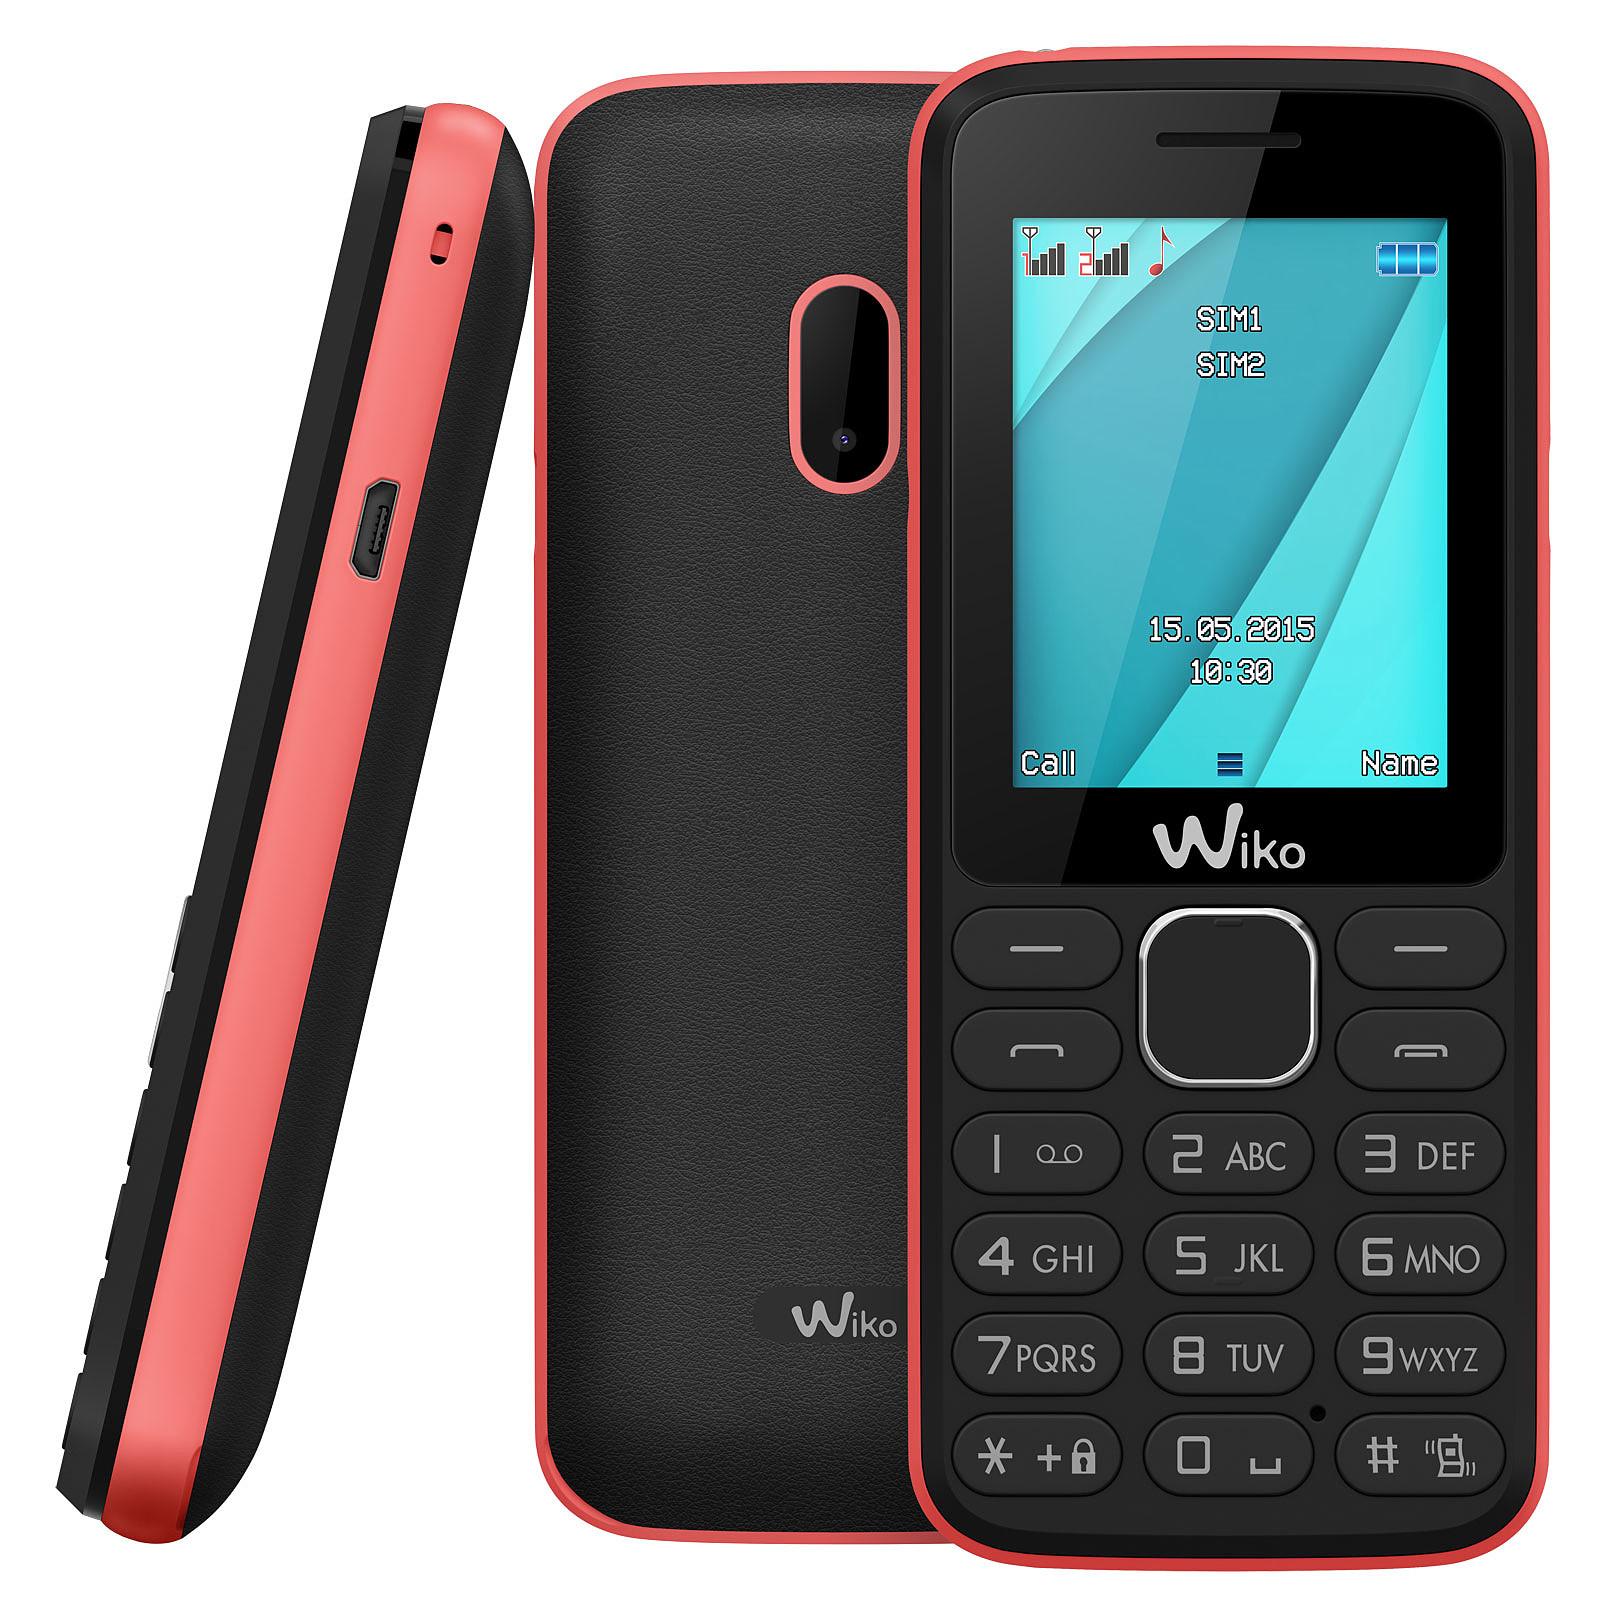 Wiko Lubi 4 Noir/Rose - Mobile & smartphone Wiko sur LDLC.com ...